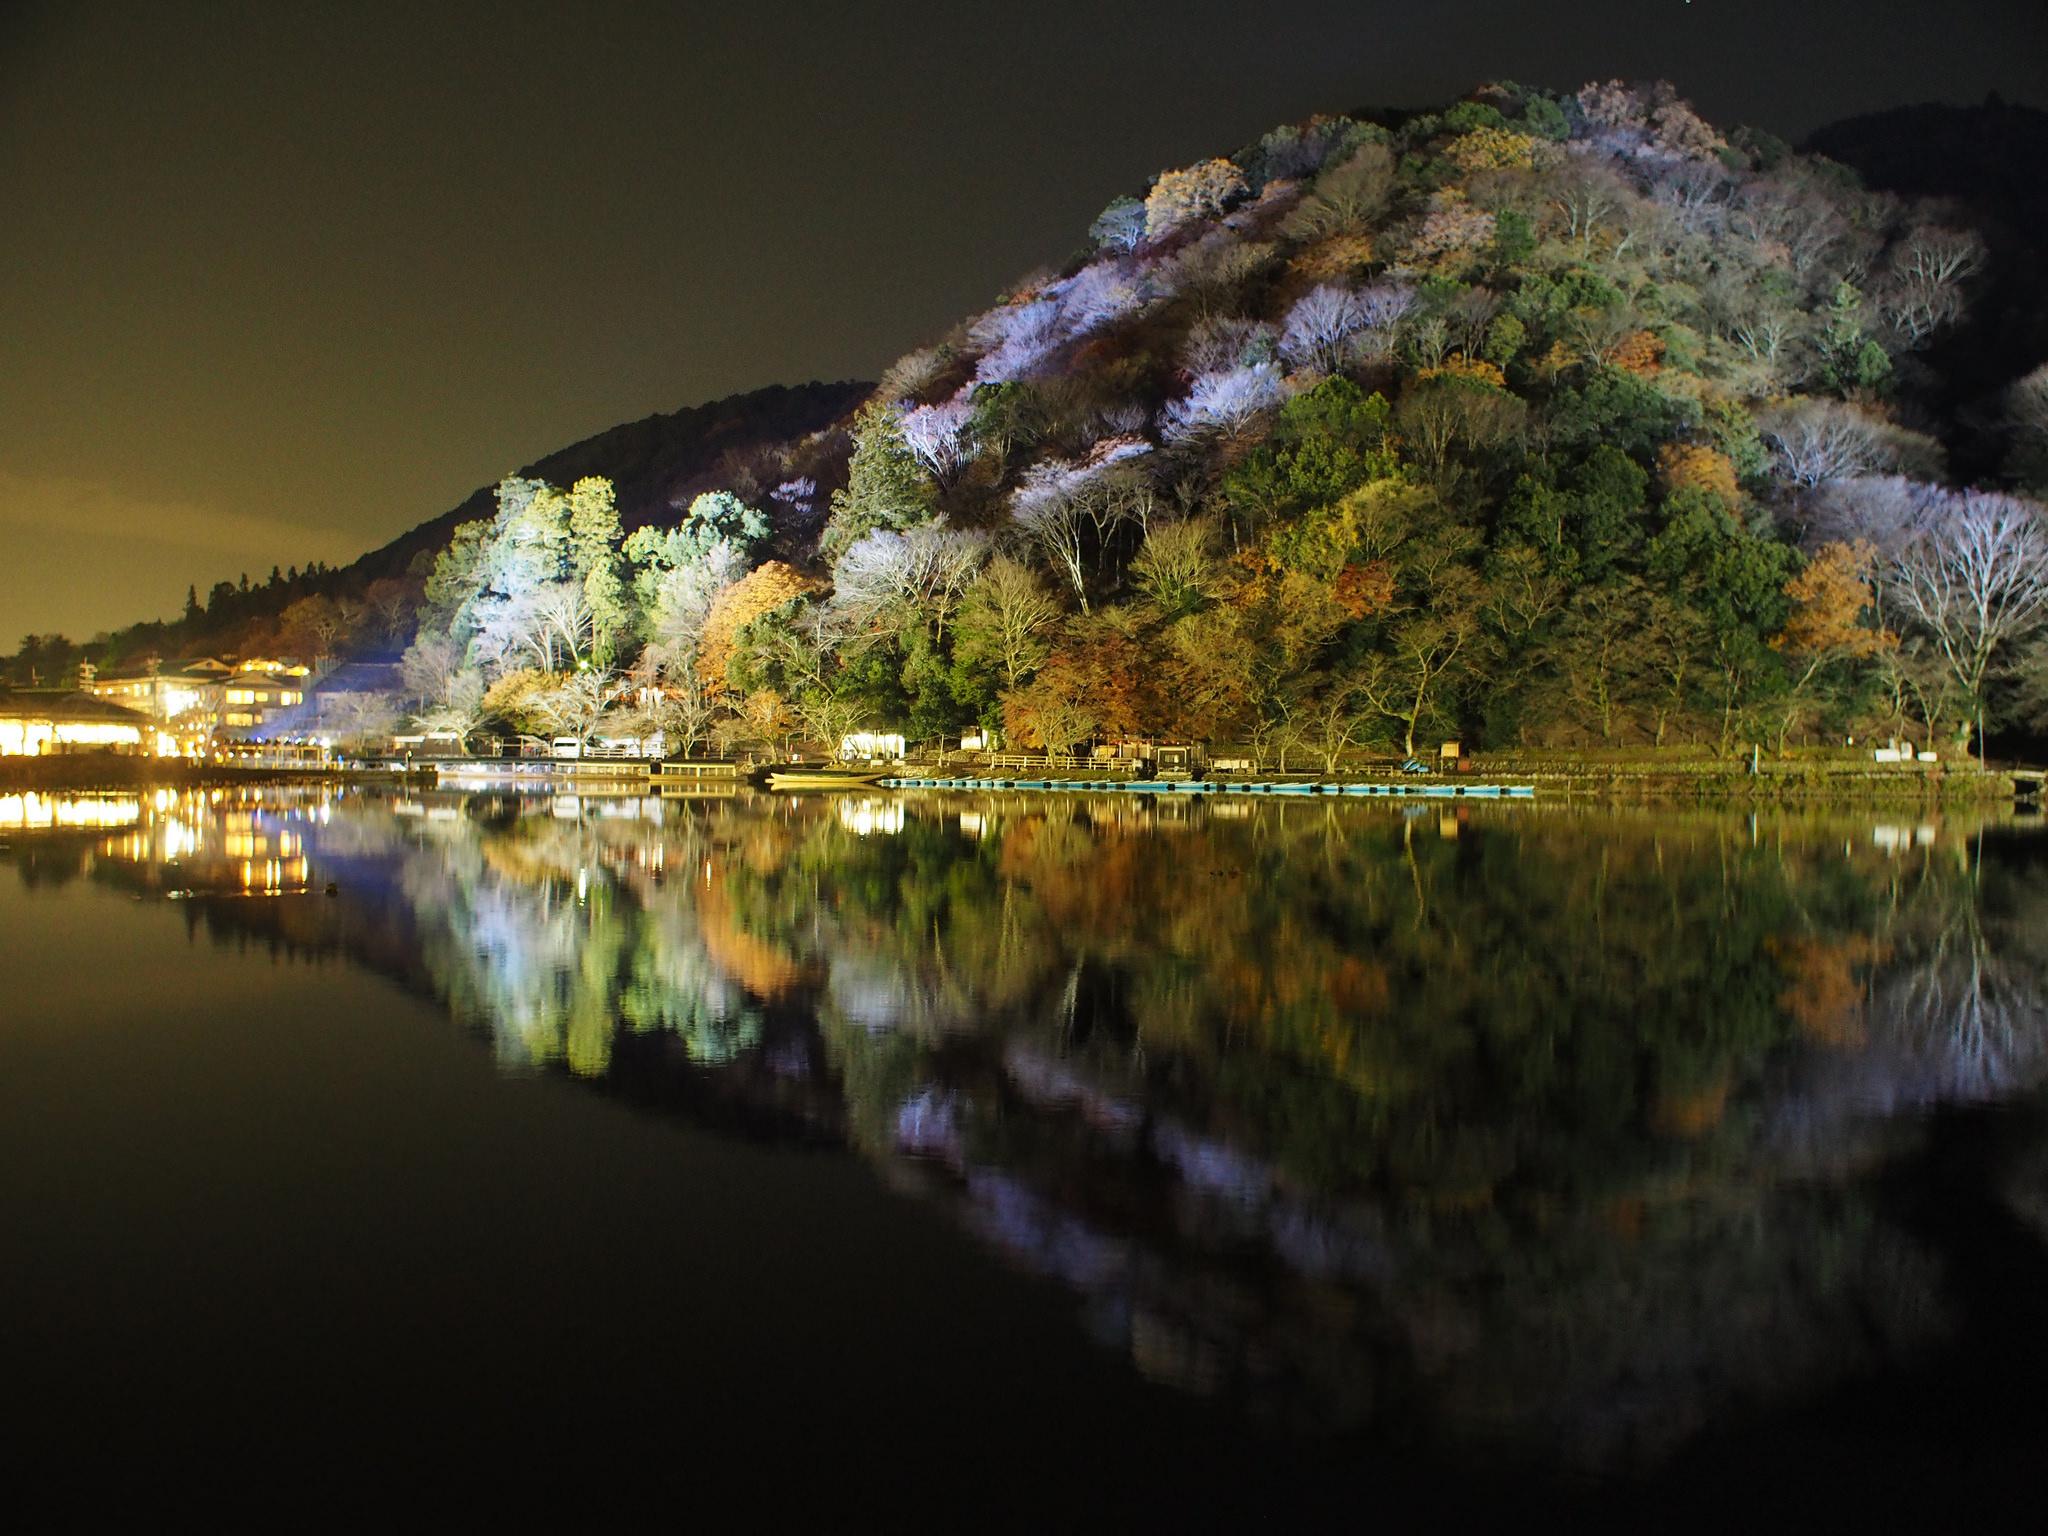 Kyoto Arashiyama Hanatouro - Illuminations